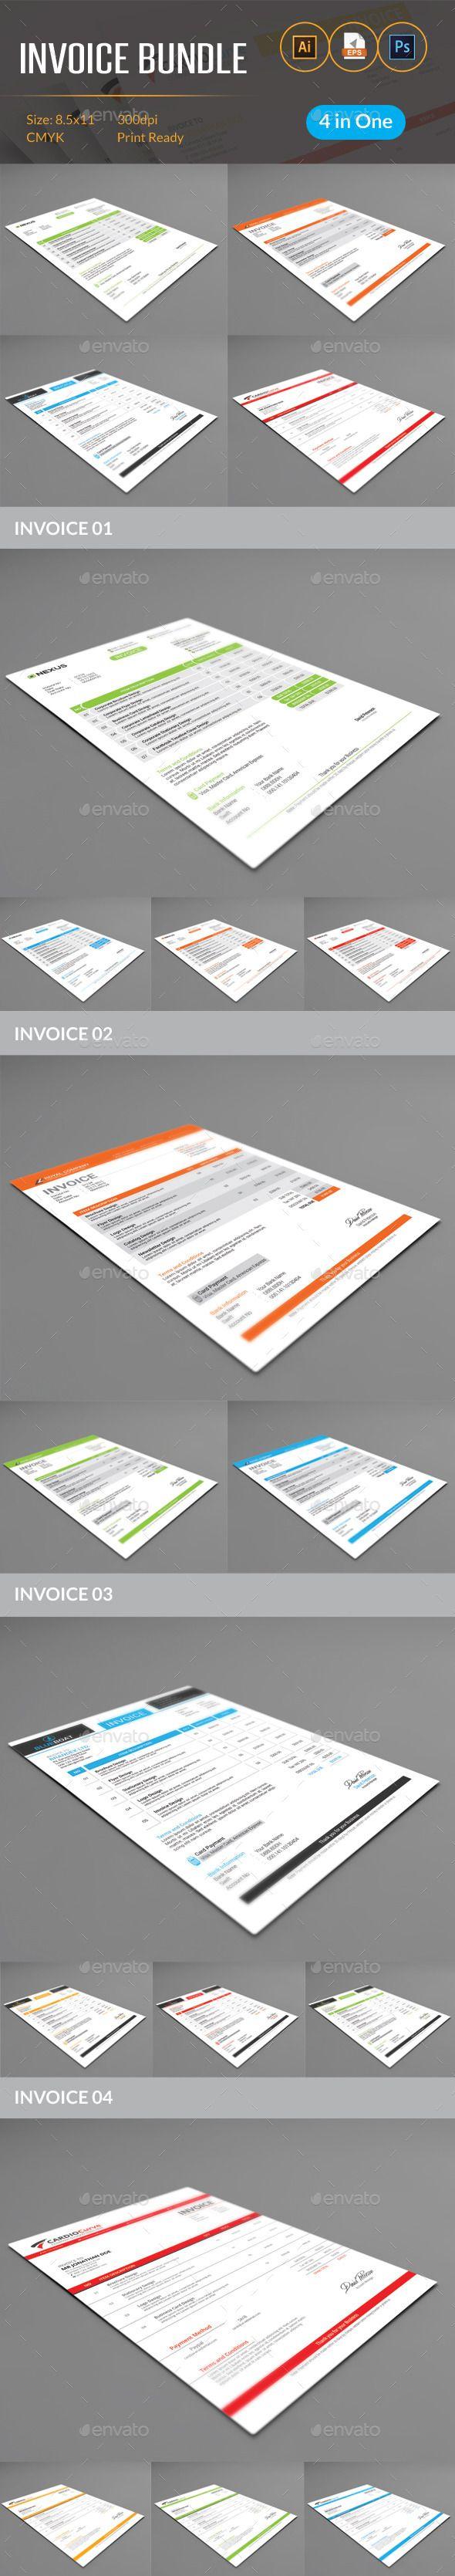 Invoice Bundle Template #design #print Download: http://graphicriver.net/item/invoice-bundle/11932629?ref=ksioks